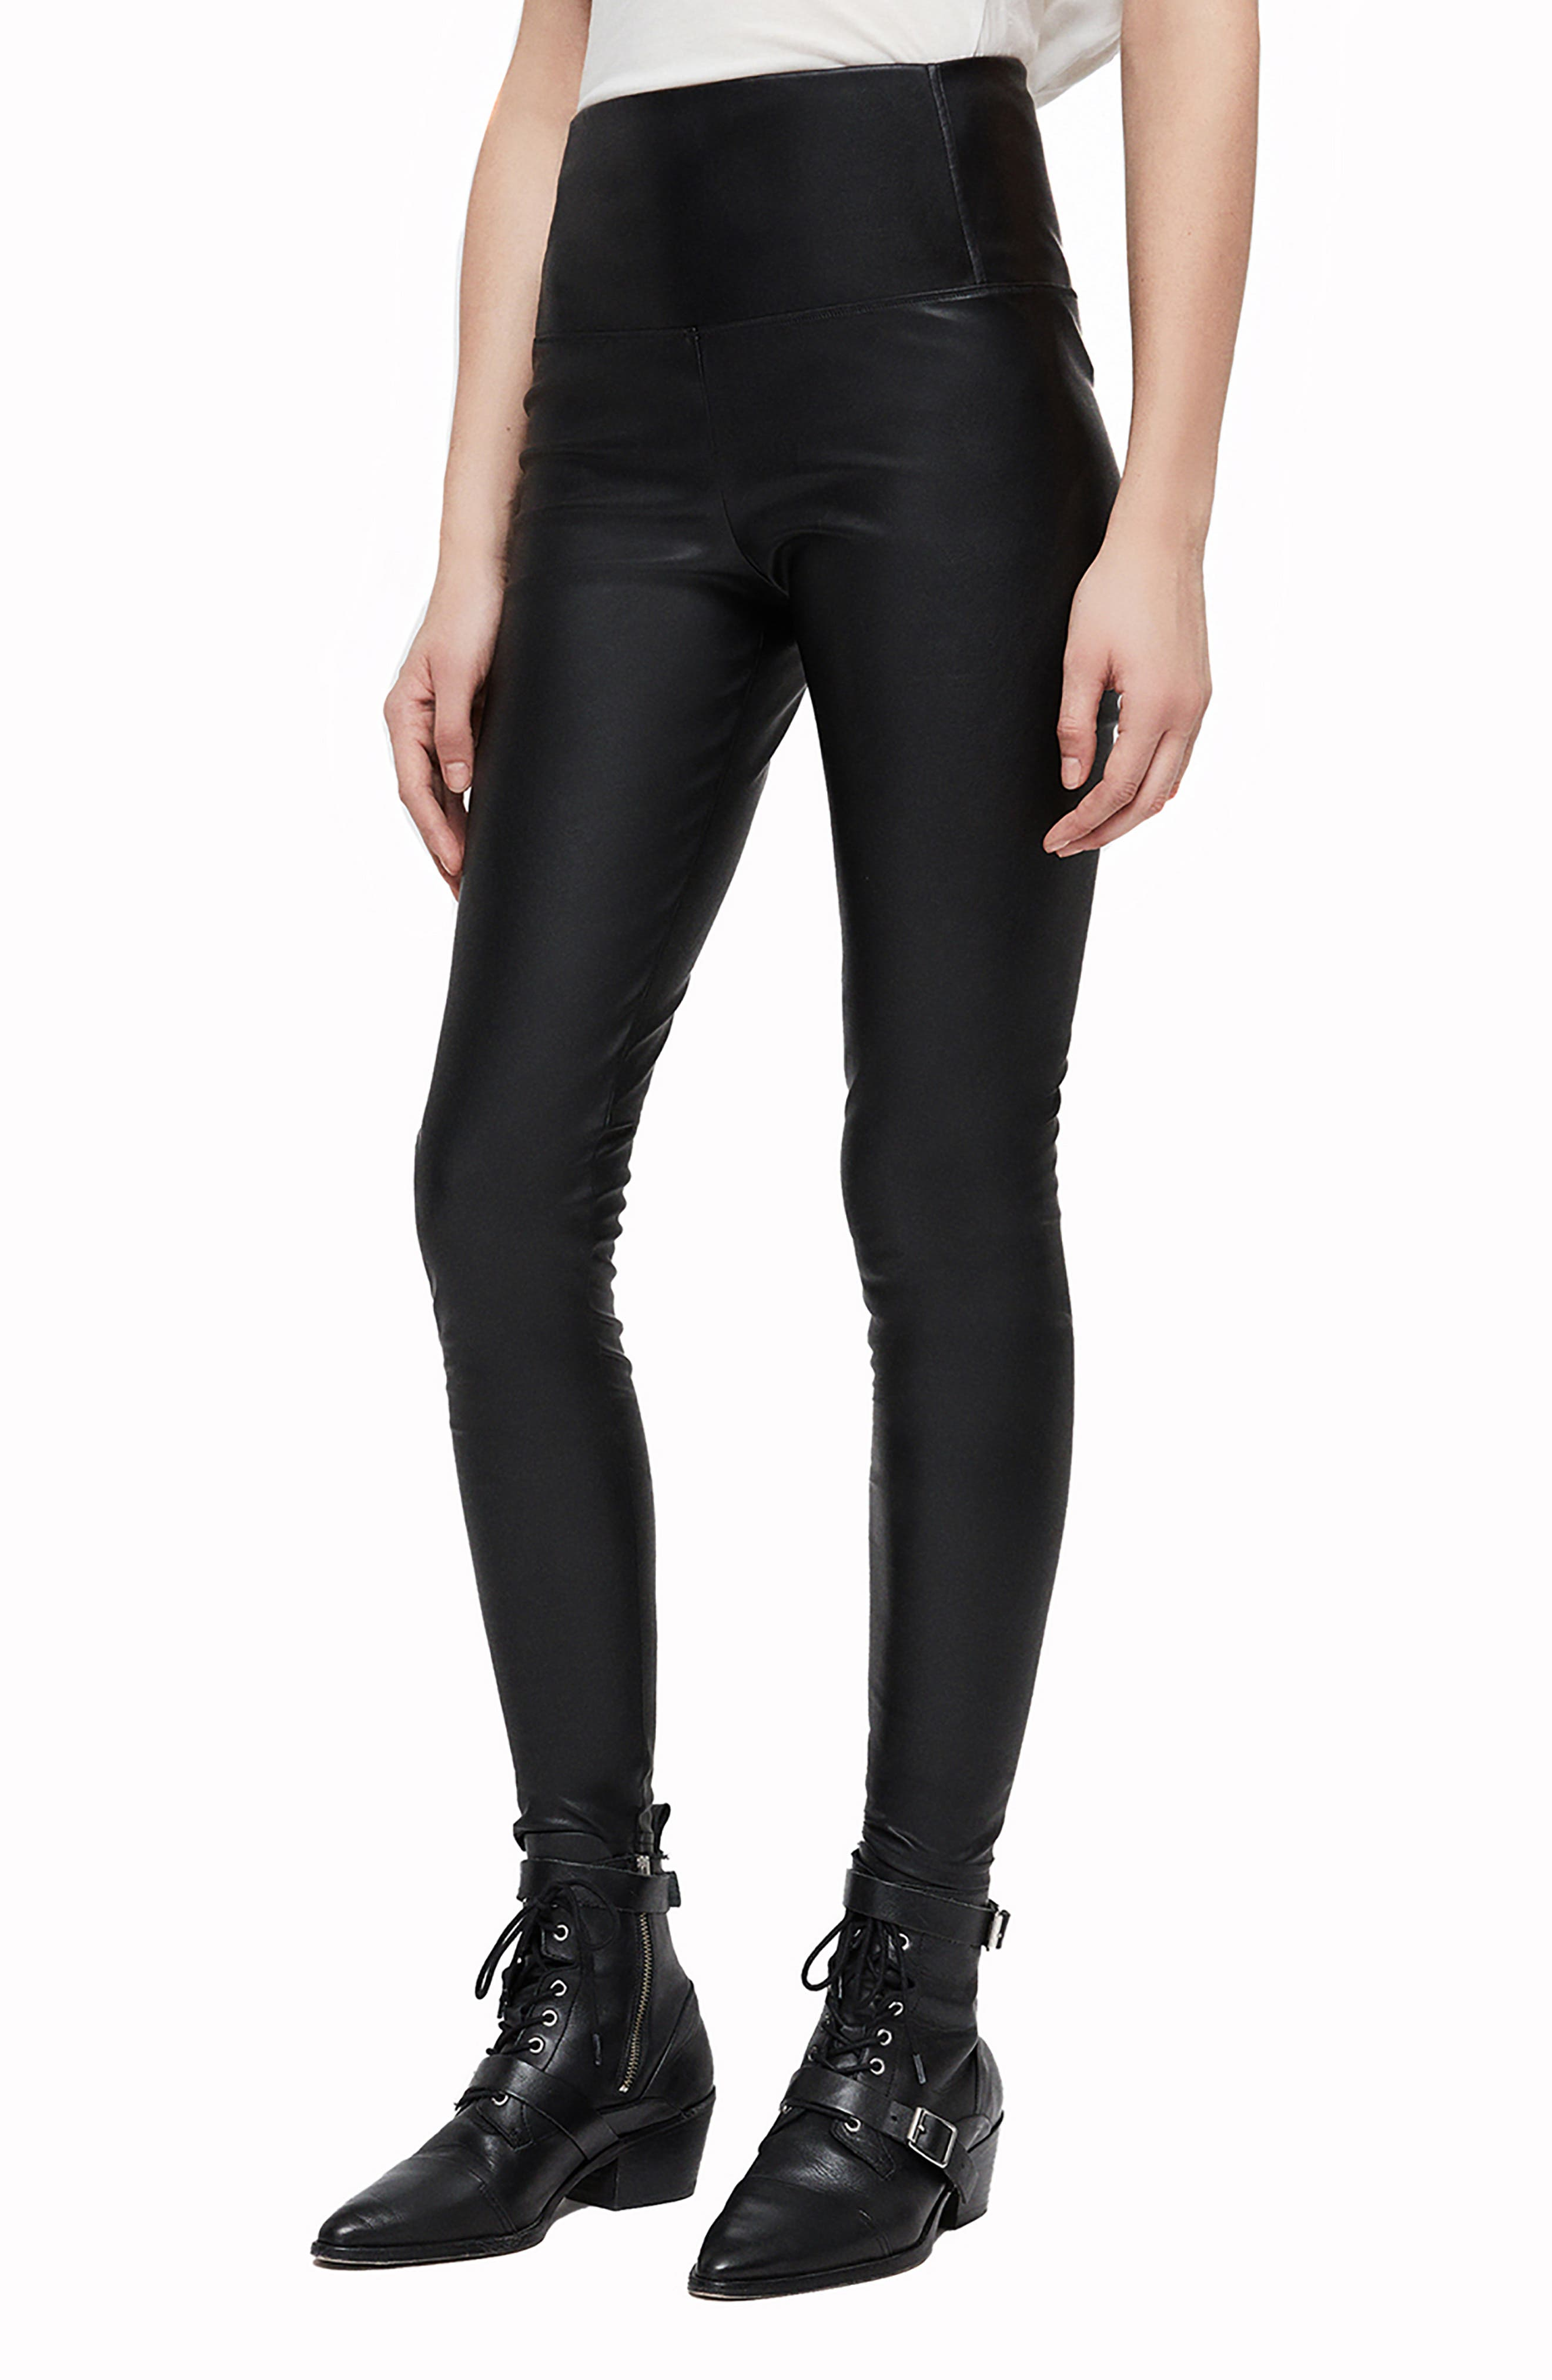 Cora Faux Leather Leggings,                             Alternate thumbnail 3, color,                             BLACK